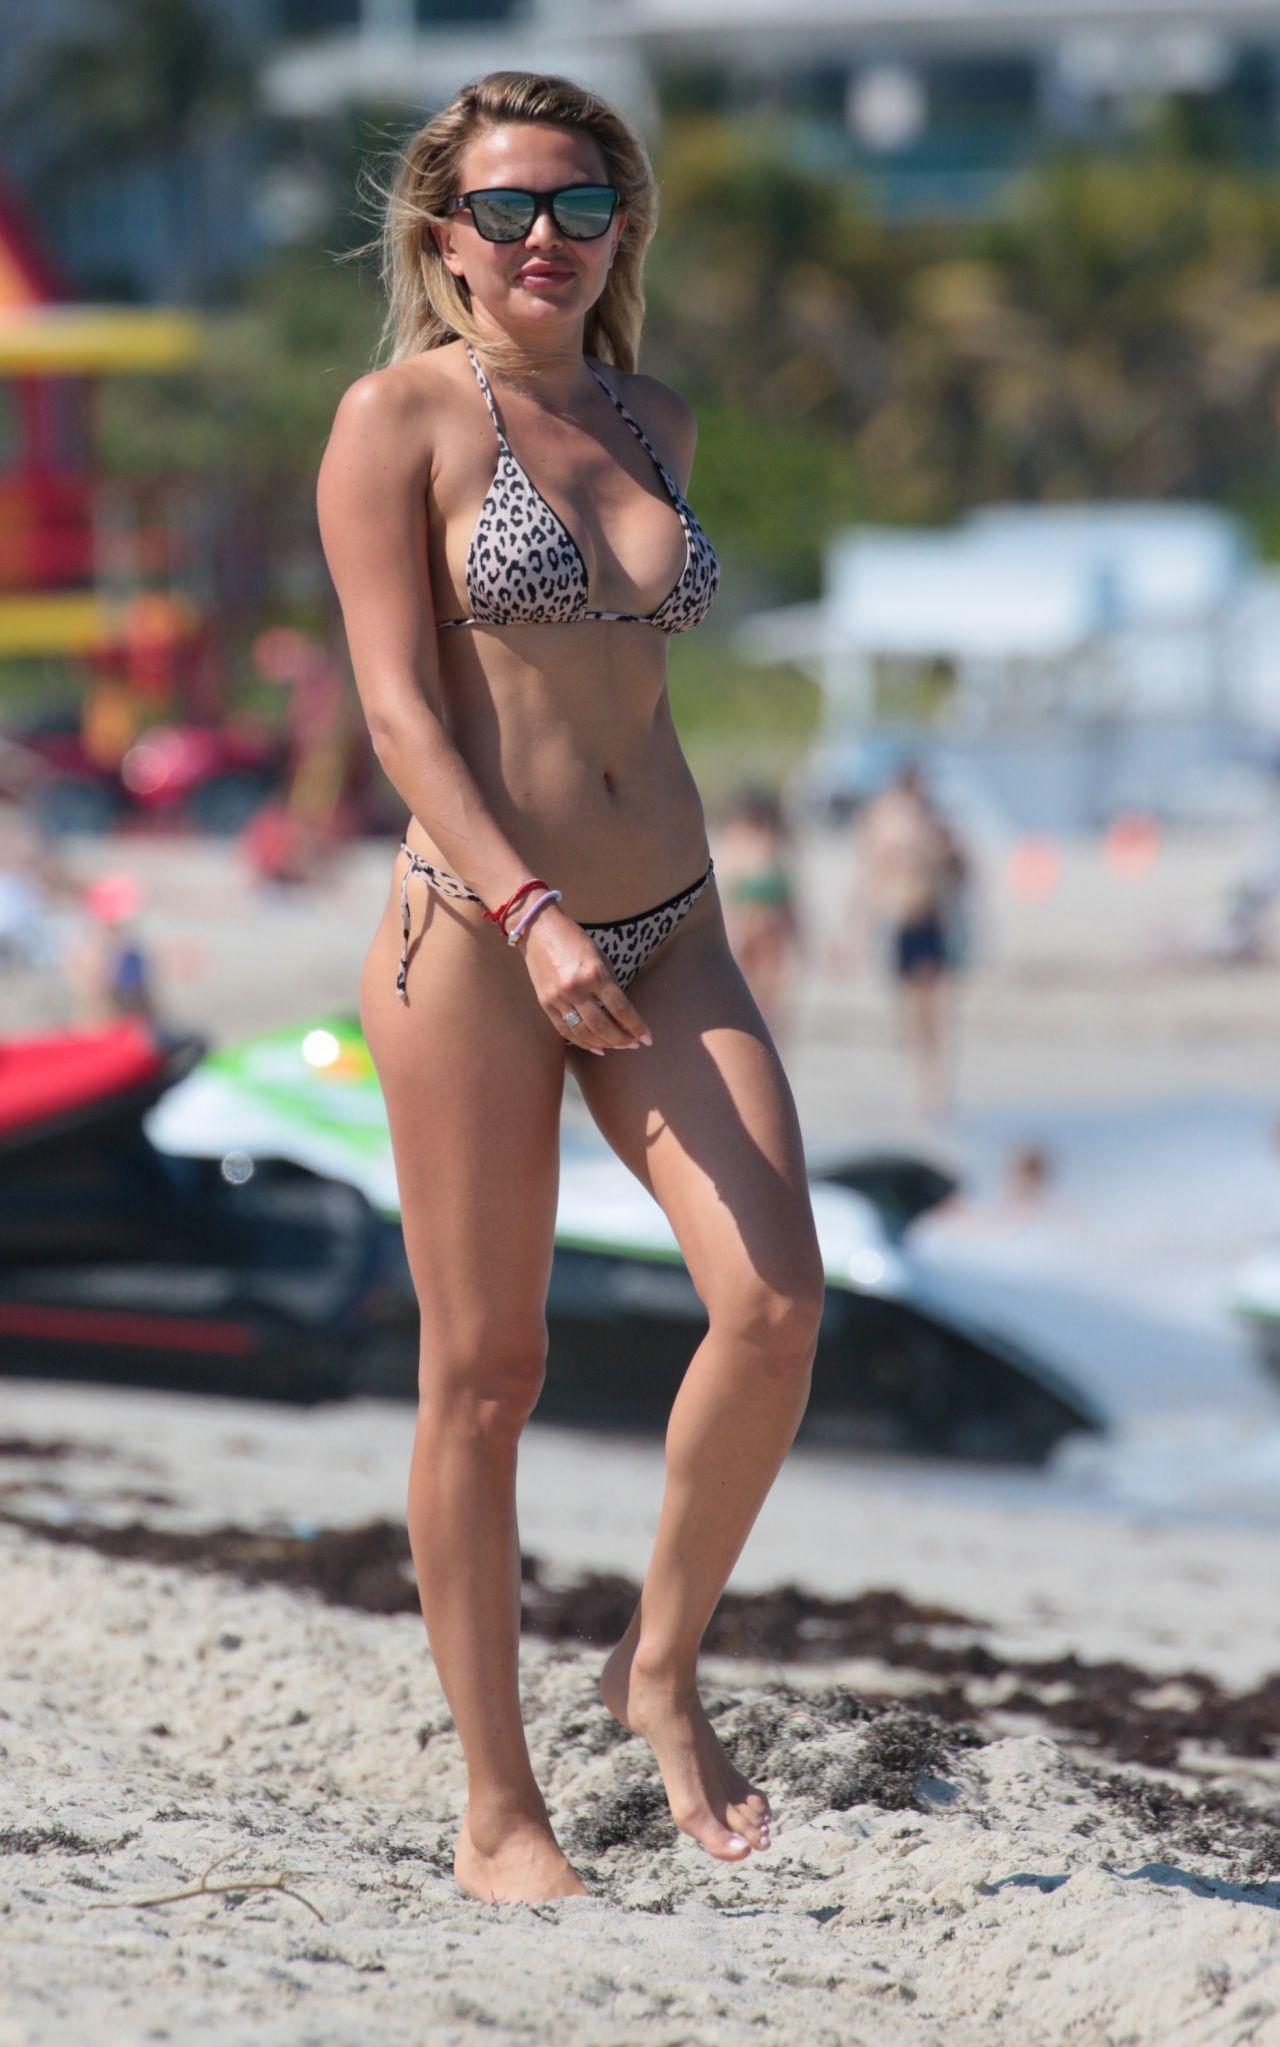 Zara holland in bikini on the beach in barbados forecast